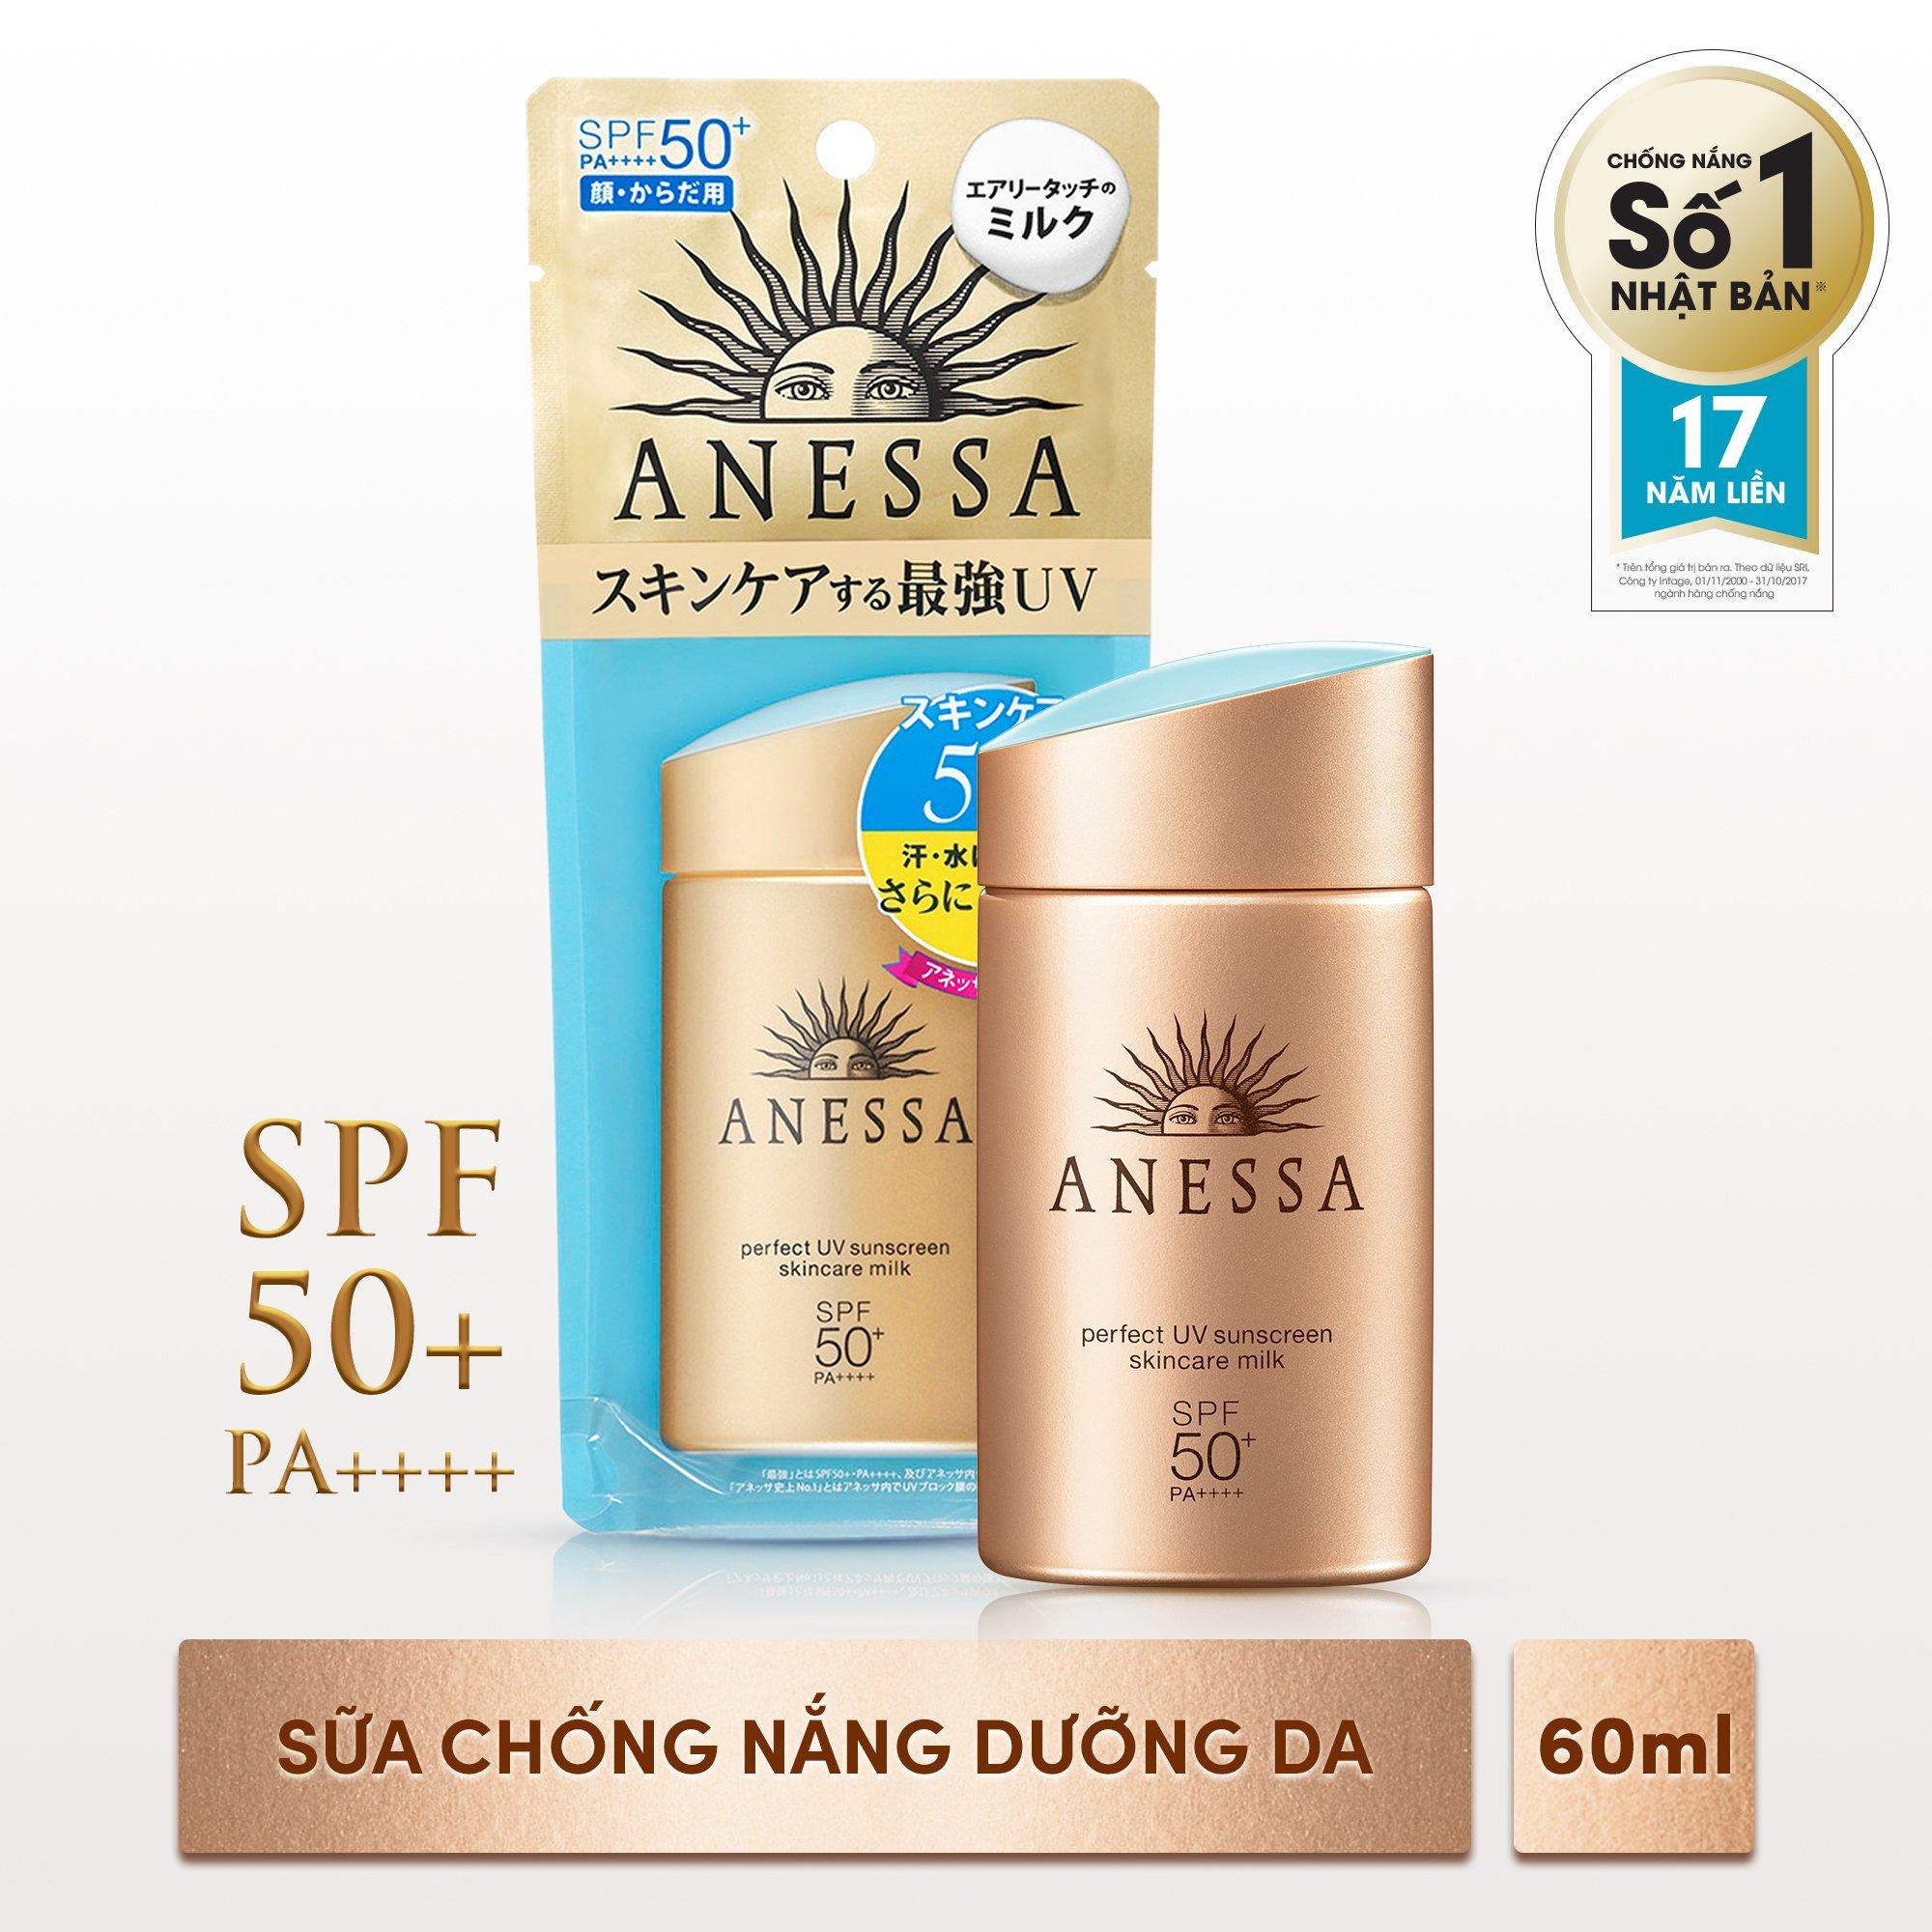 Kem Chống Nắng Anessa Perfect UV Sunscreen Skincare Milk Spf 50+ Pa++++ 60ml